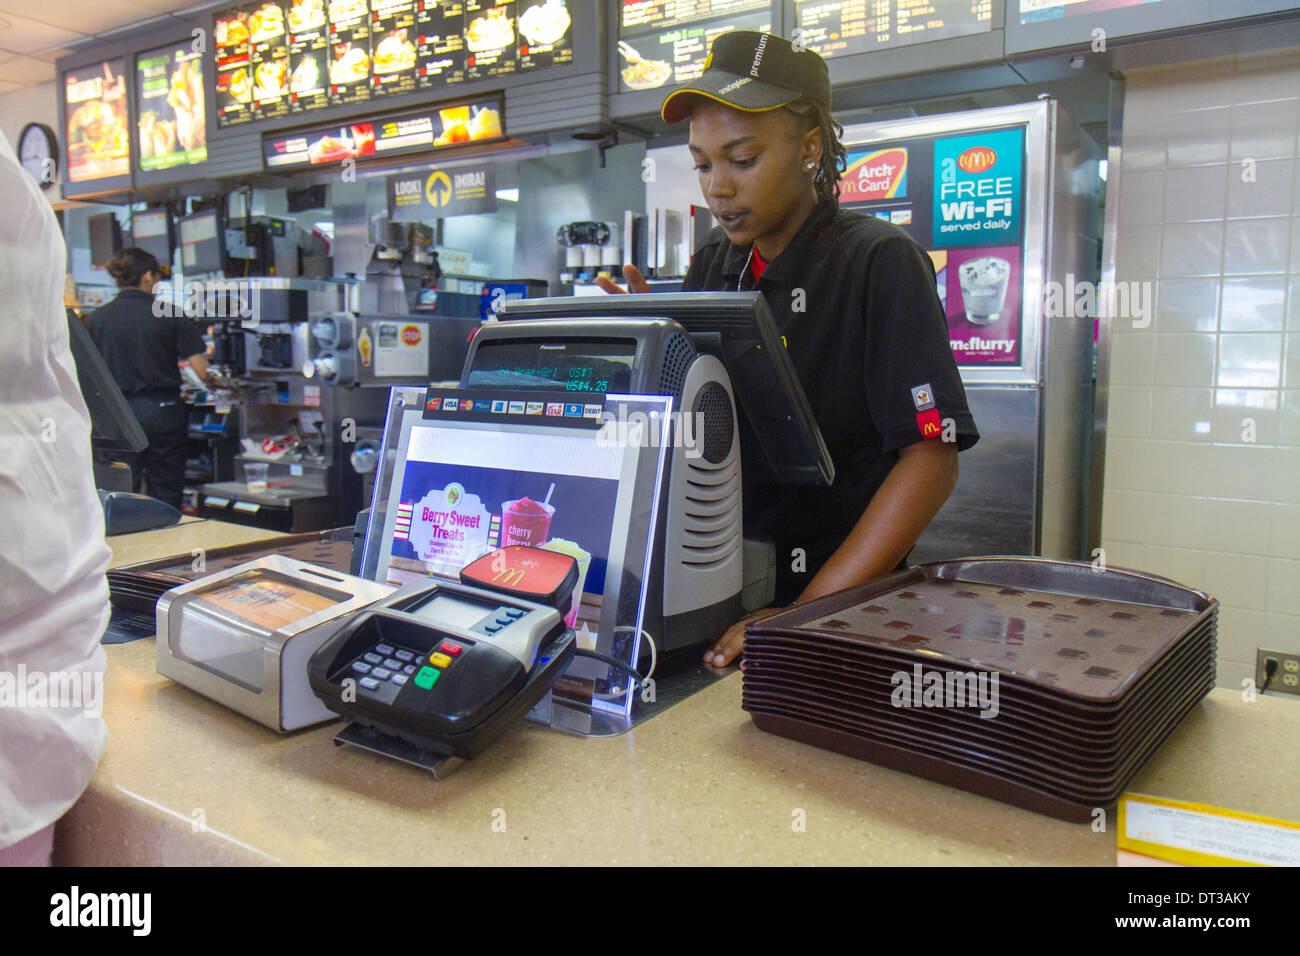 Florida Fort Pierce SR70 McDonald Restaurant Business Fastfood Hamburger Kette Zähler schwarzes Mädchen Teen Arbeiter Kasse Job unif Stockbild